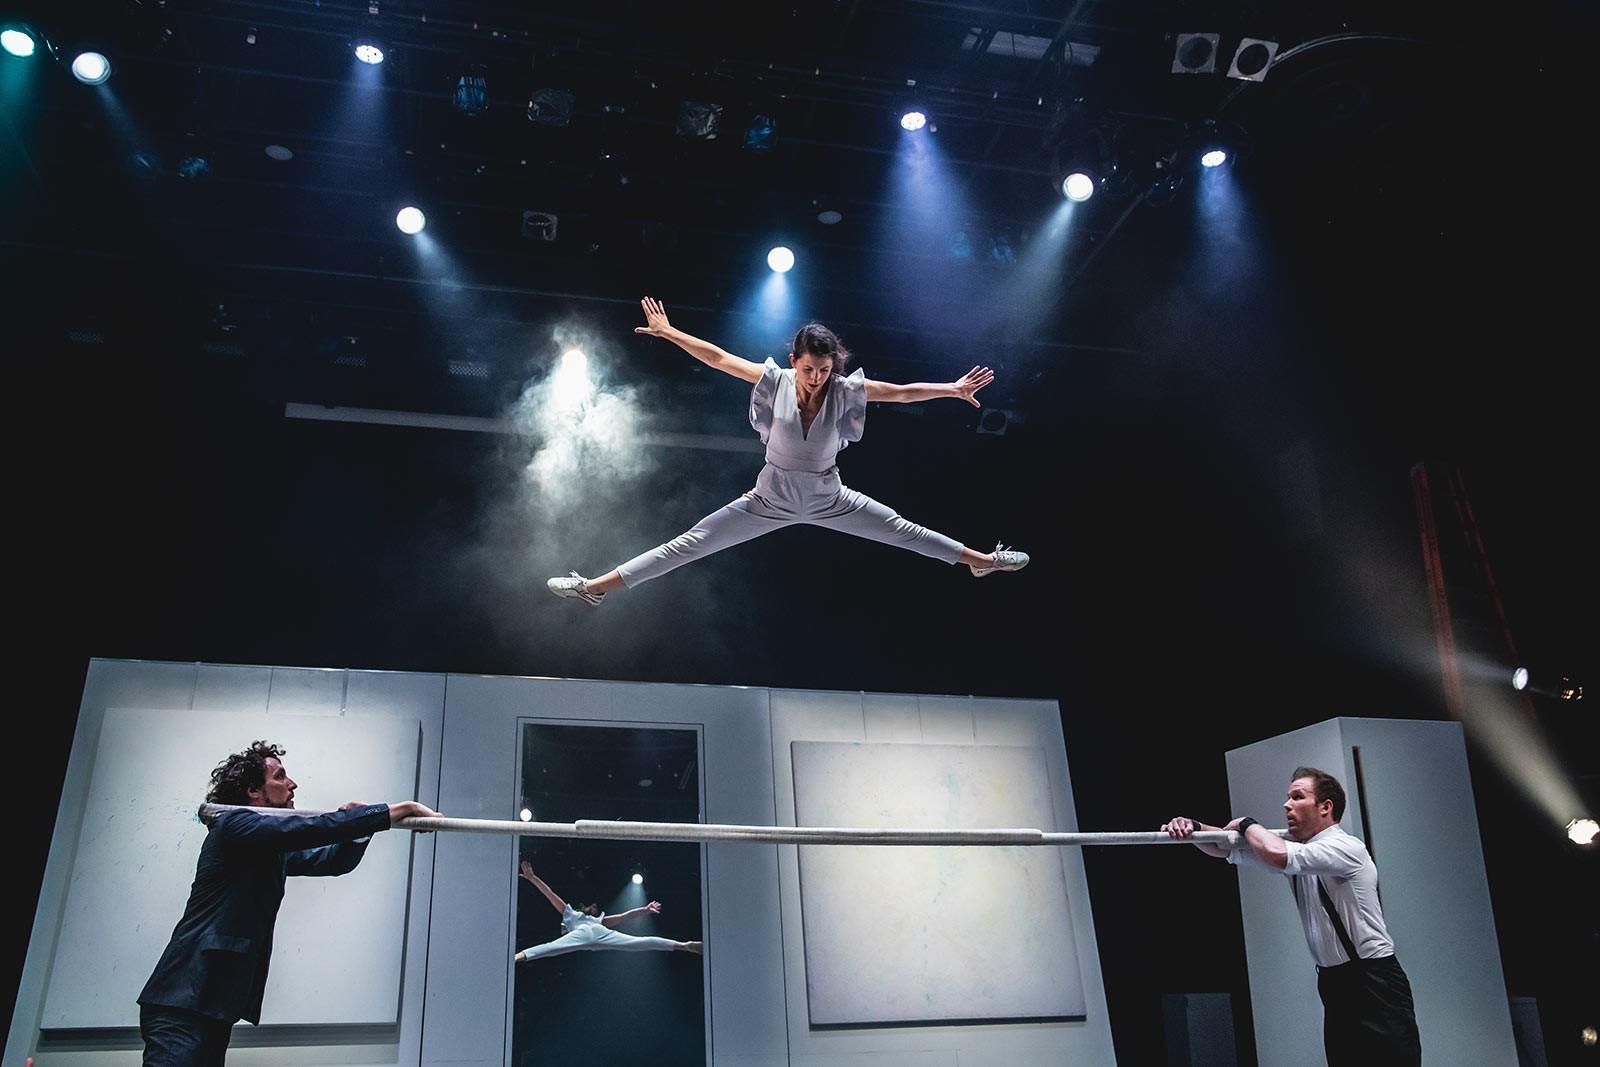 La galerie : 30-03-2021 au PBA (cirque)